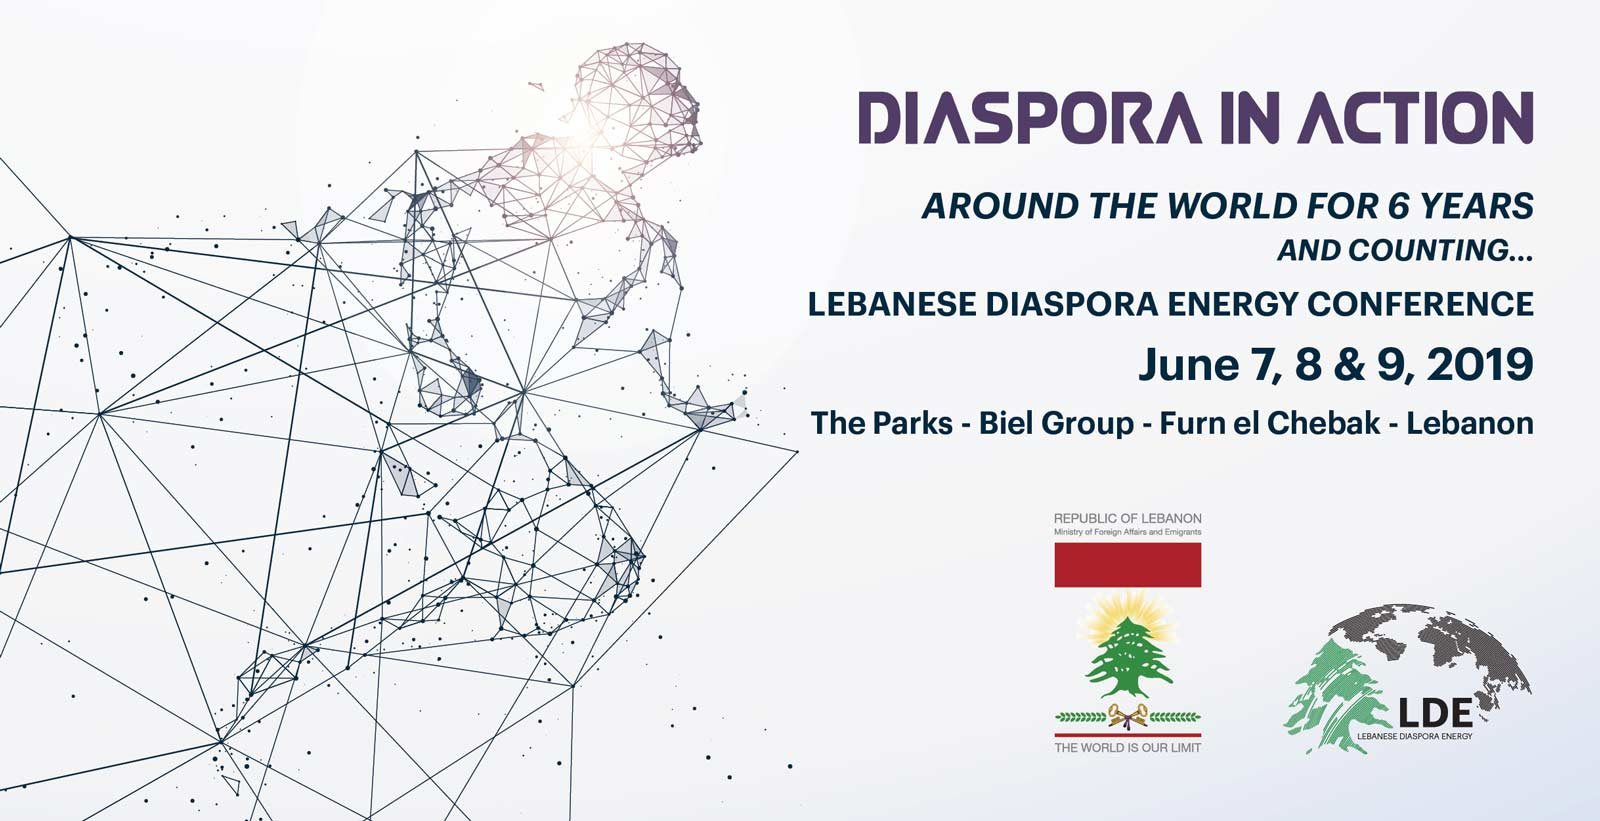 Dr. Tonio Fenech at the Lebanese Diaspora Energy Conference